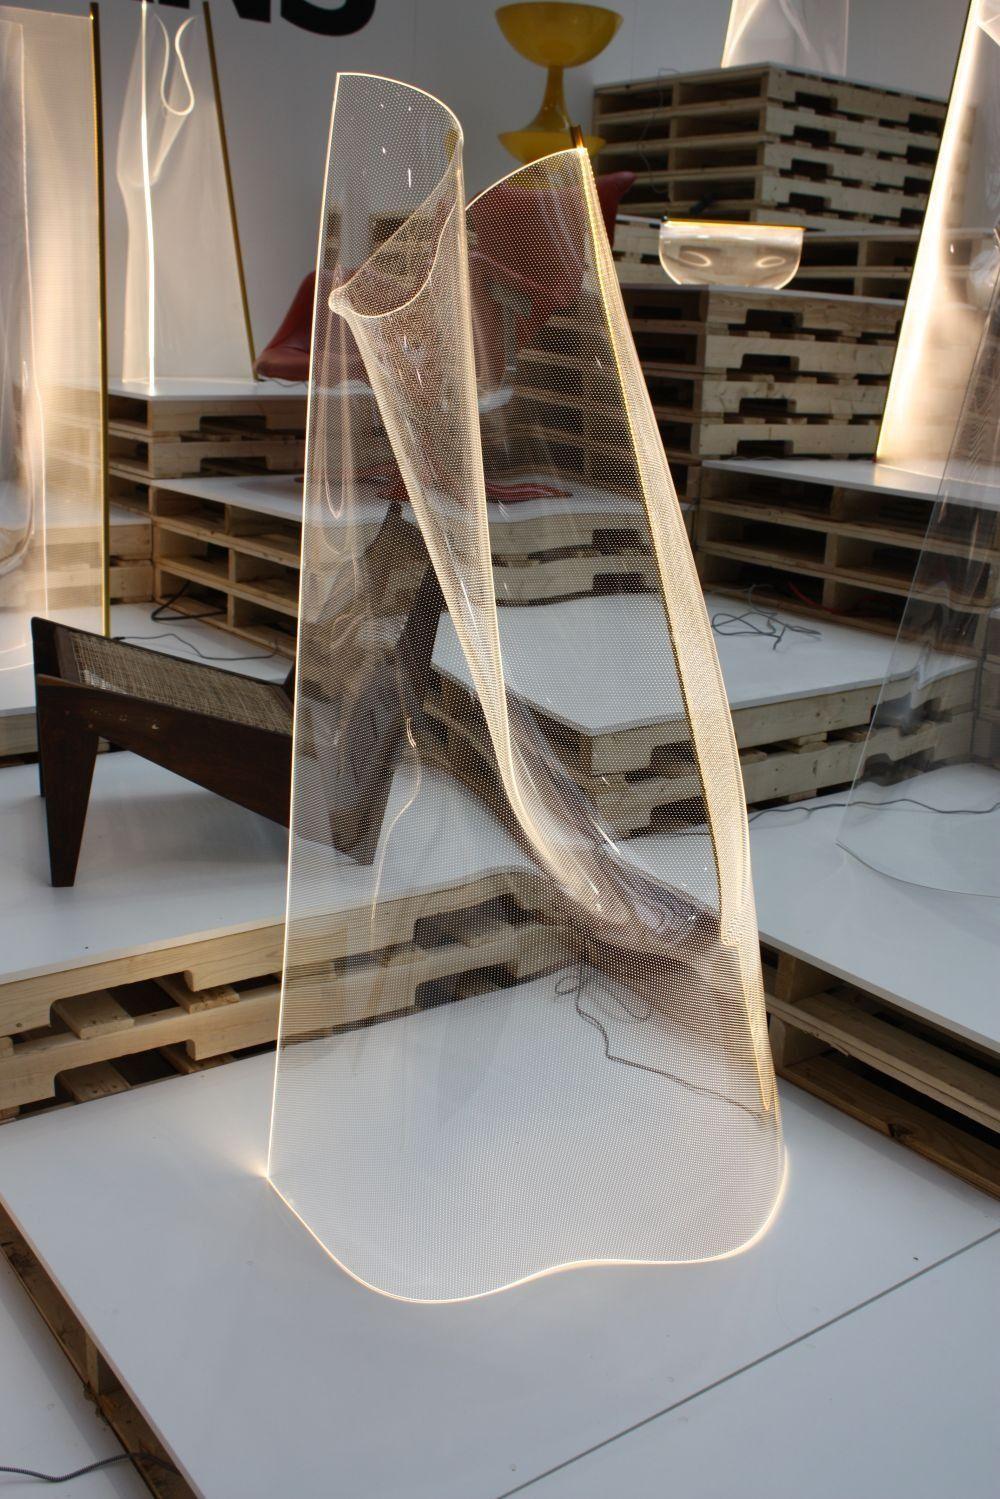 Acrylic Sheets Transform Light Into An Architectural Sculpture In 2020 Architectural Sculpture Luxury Lamps Light Sculpture